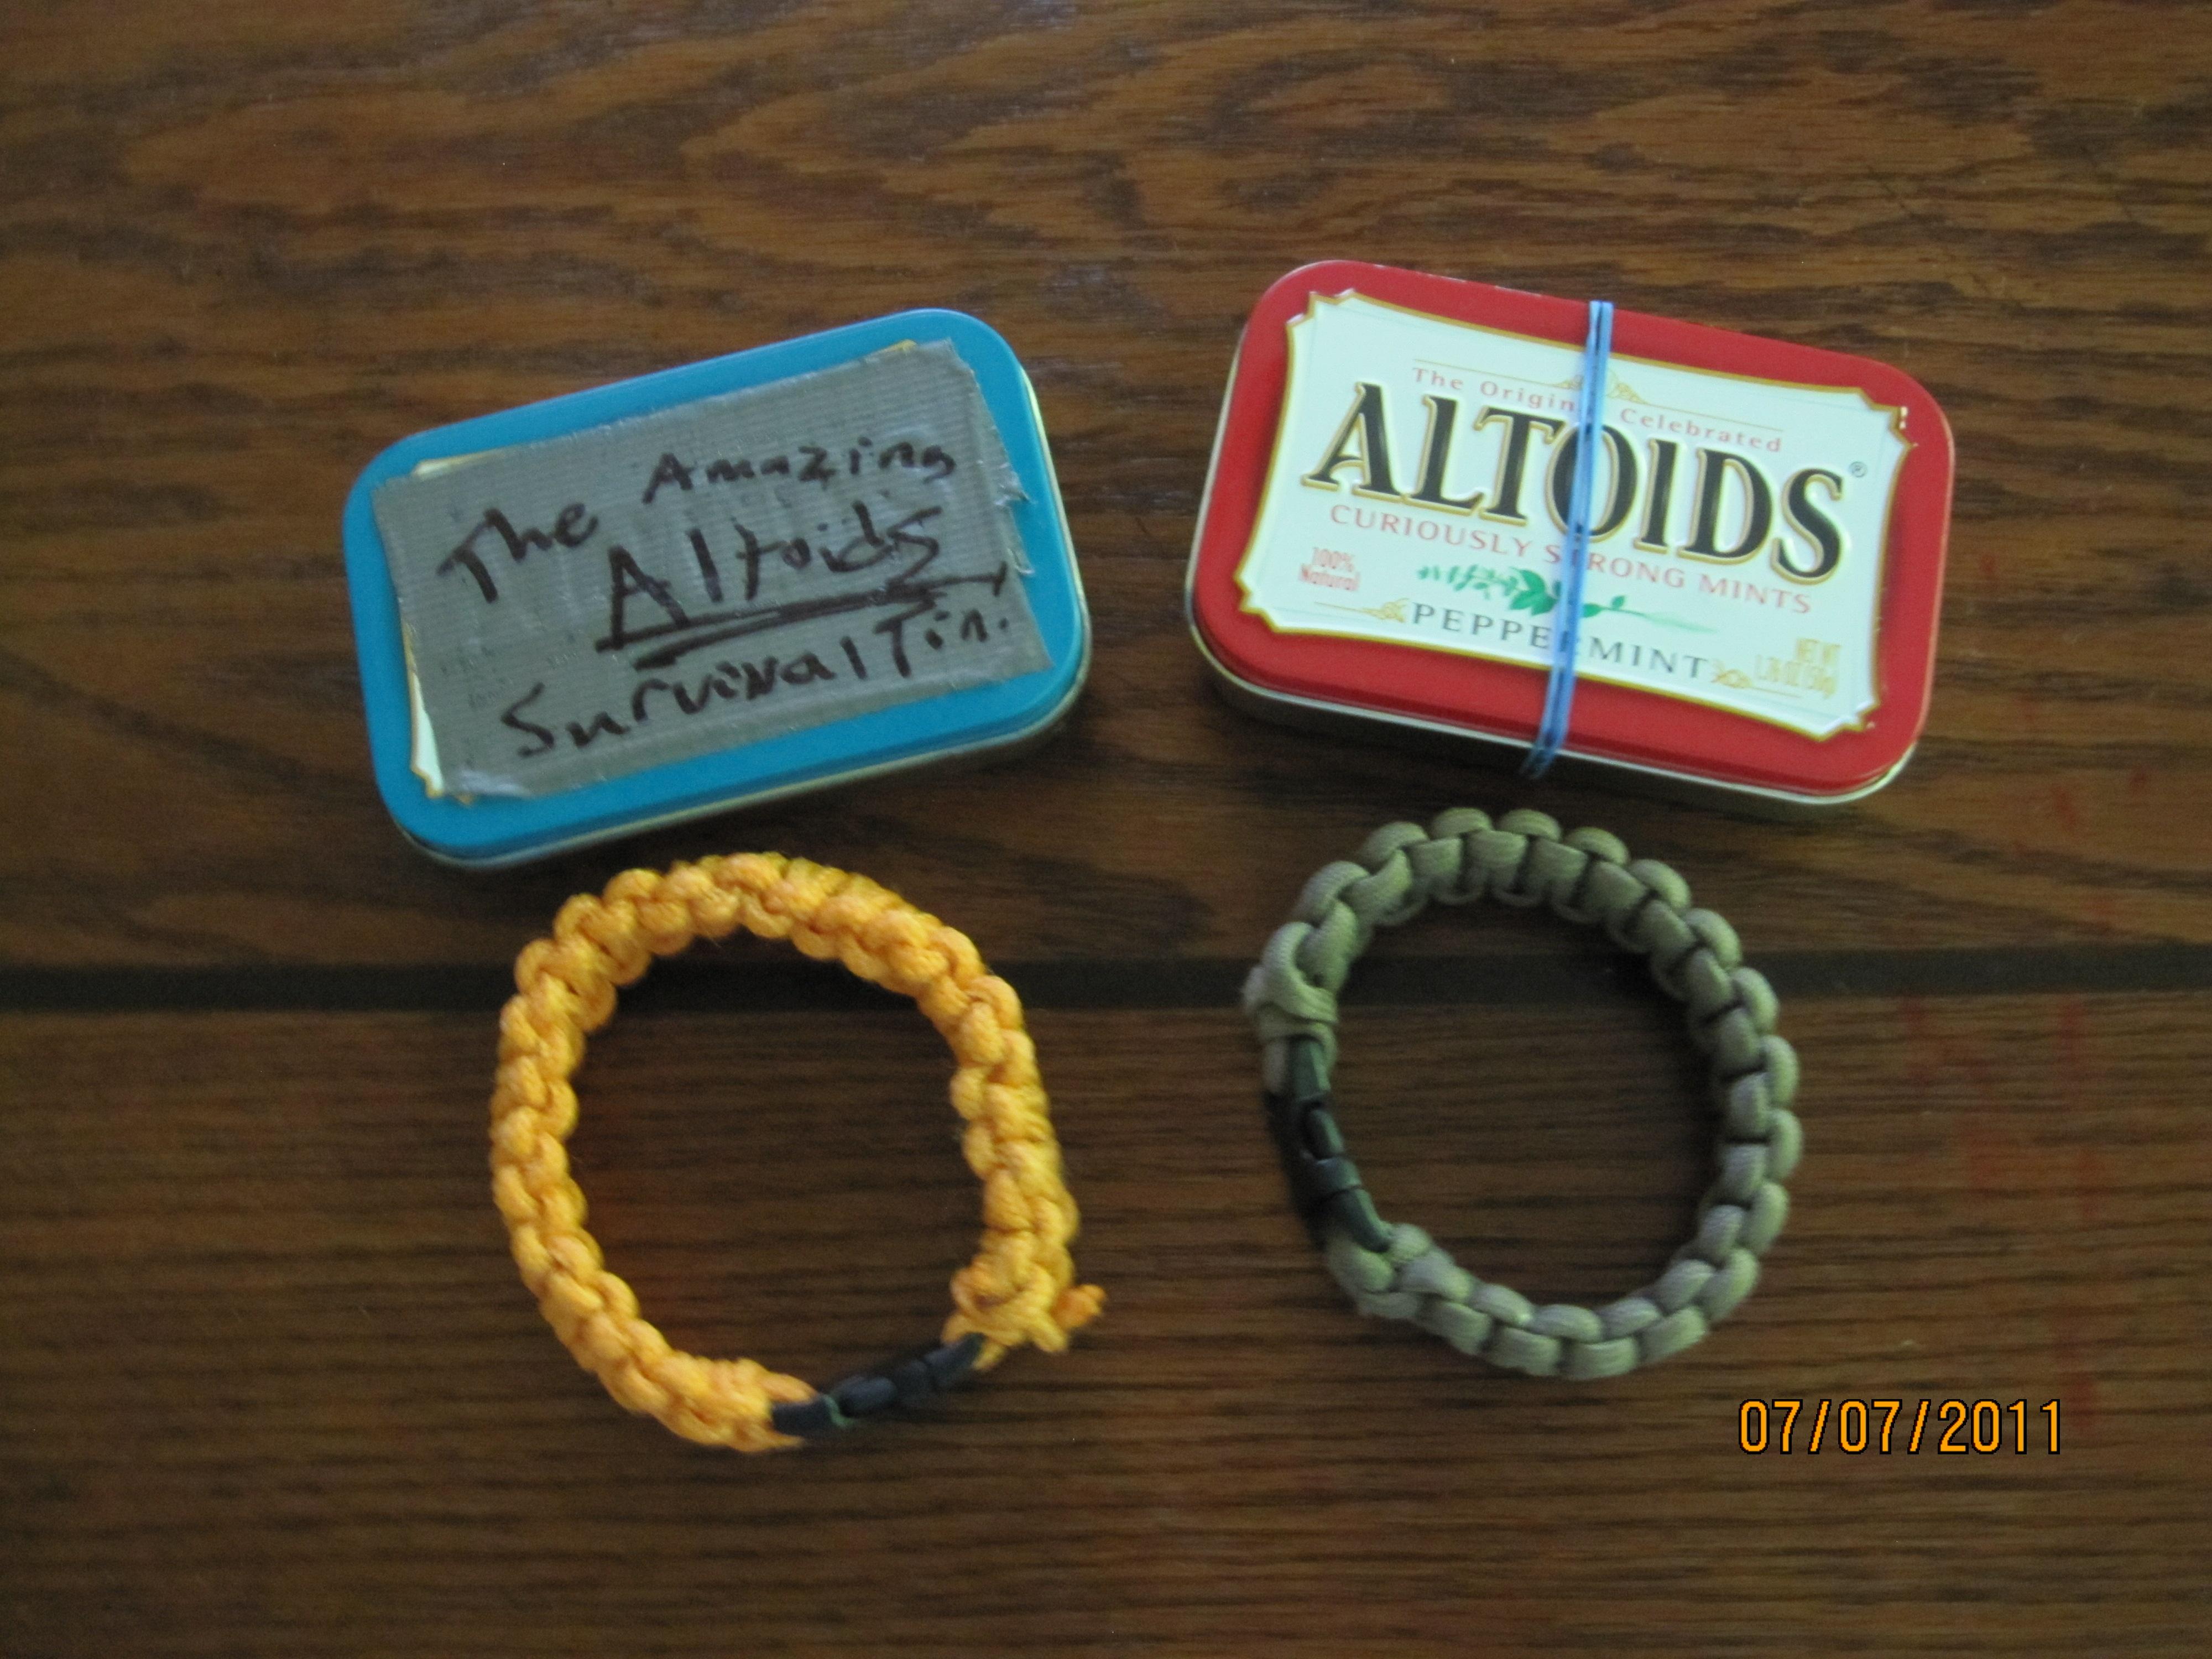 THE Other Altoids Survival Kit